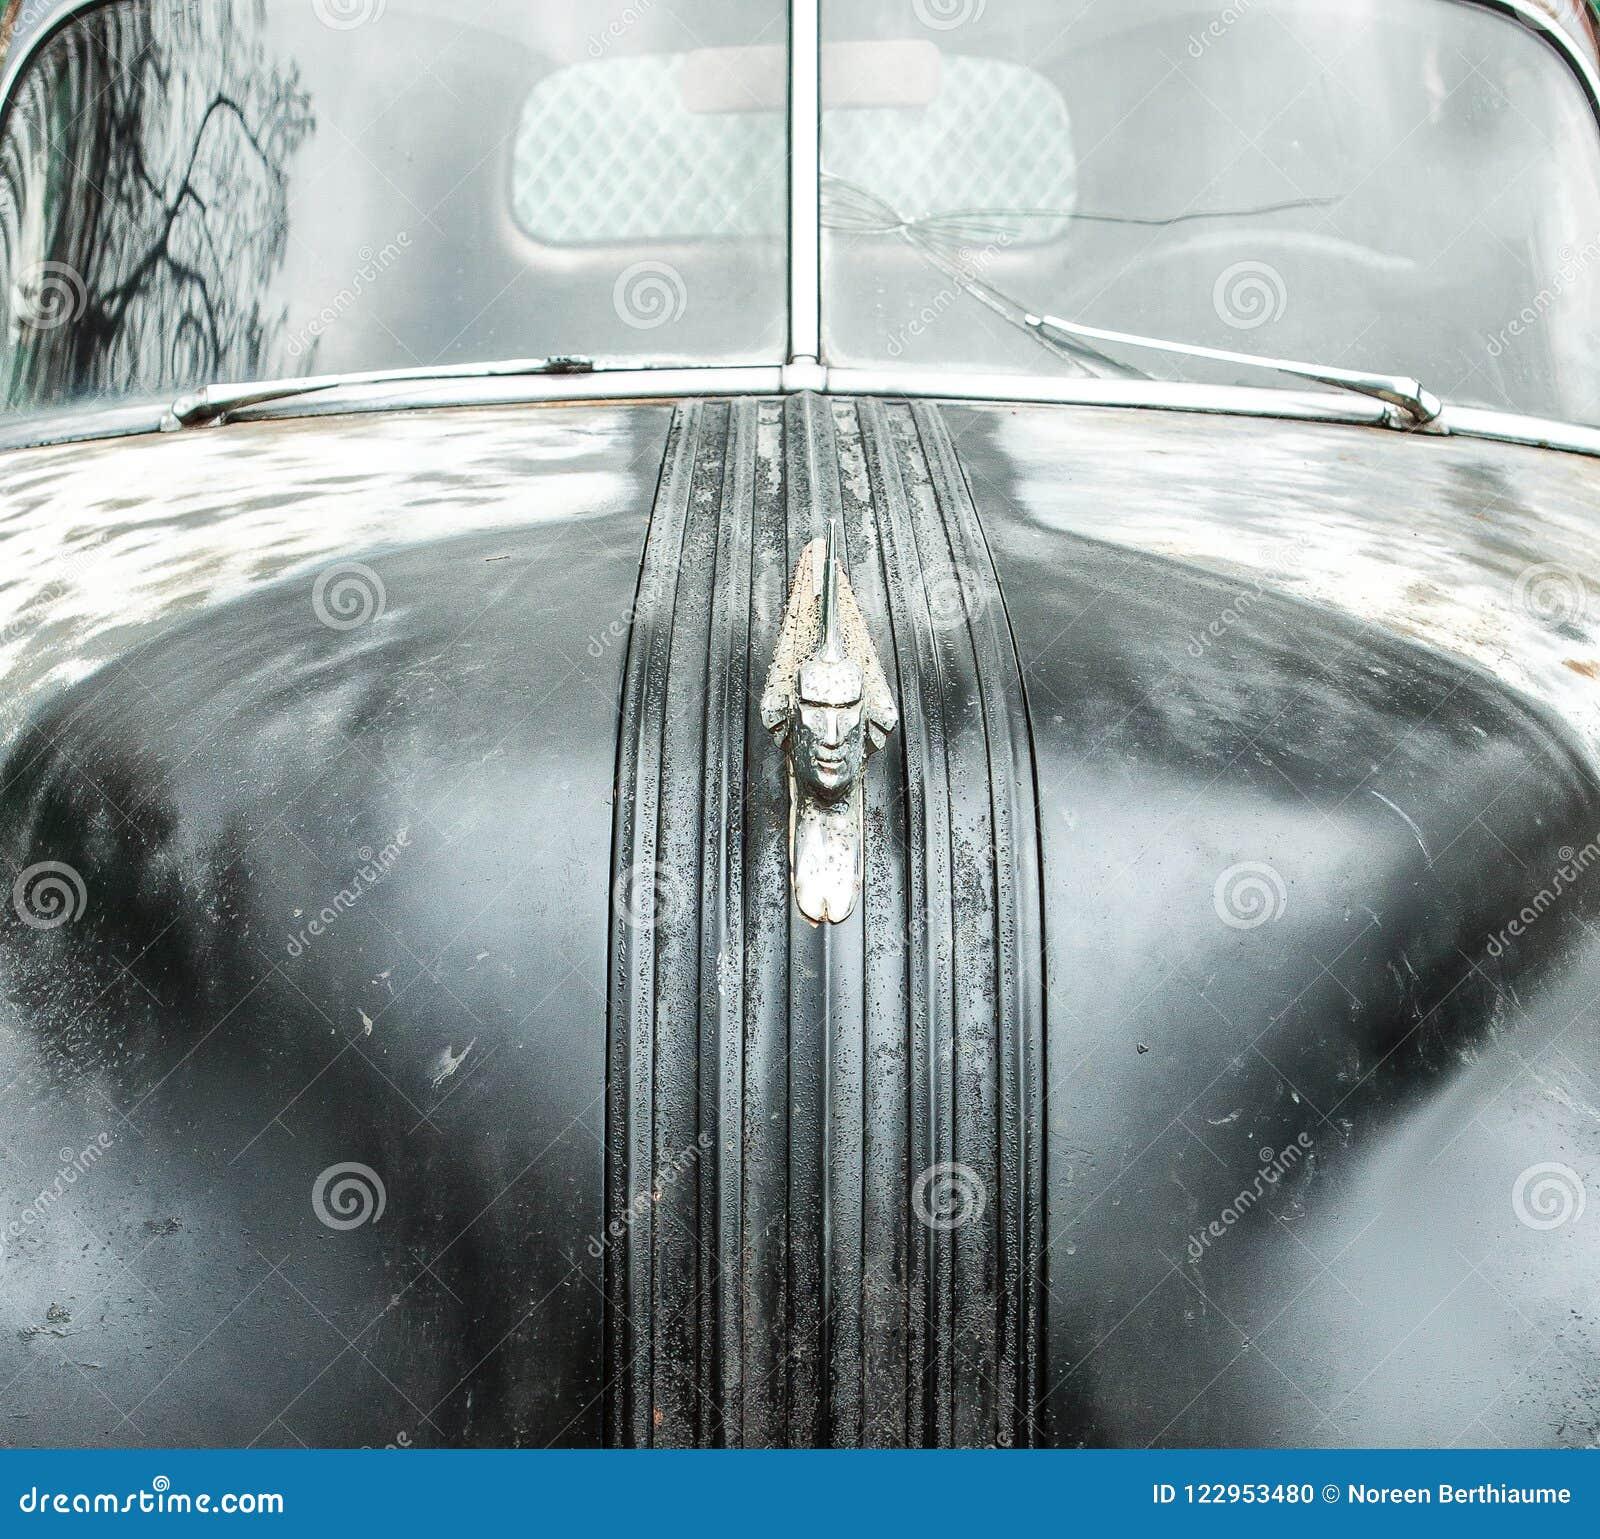 Junkyard Abandoned Pontiac Car Hood Ornament Stock Photo